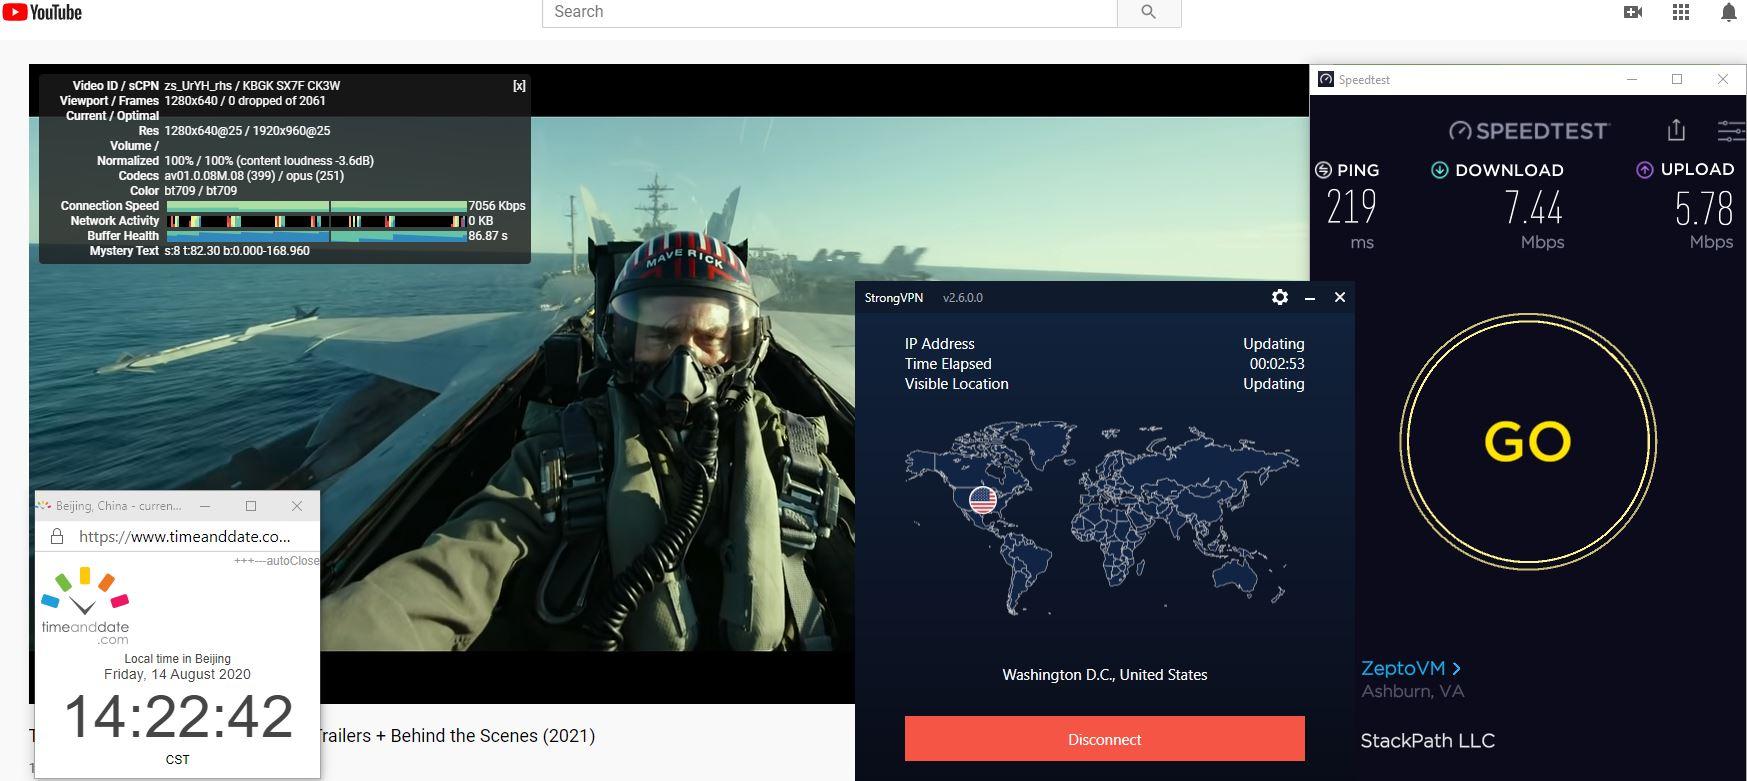 Windows10 StrongVPN IKEv2 USA - Washington DC 中国VPN 翻墙 科学上网 翻墙速度测试 - 20200814